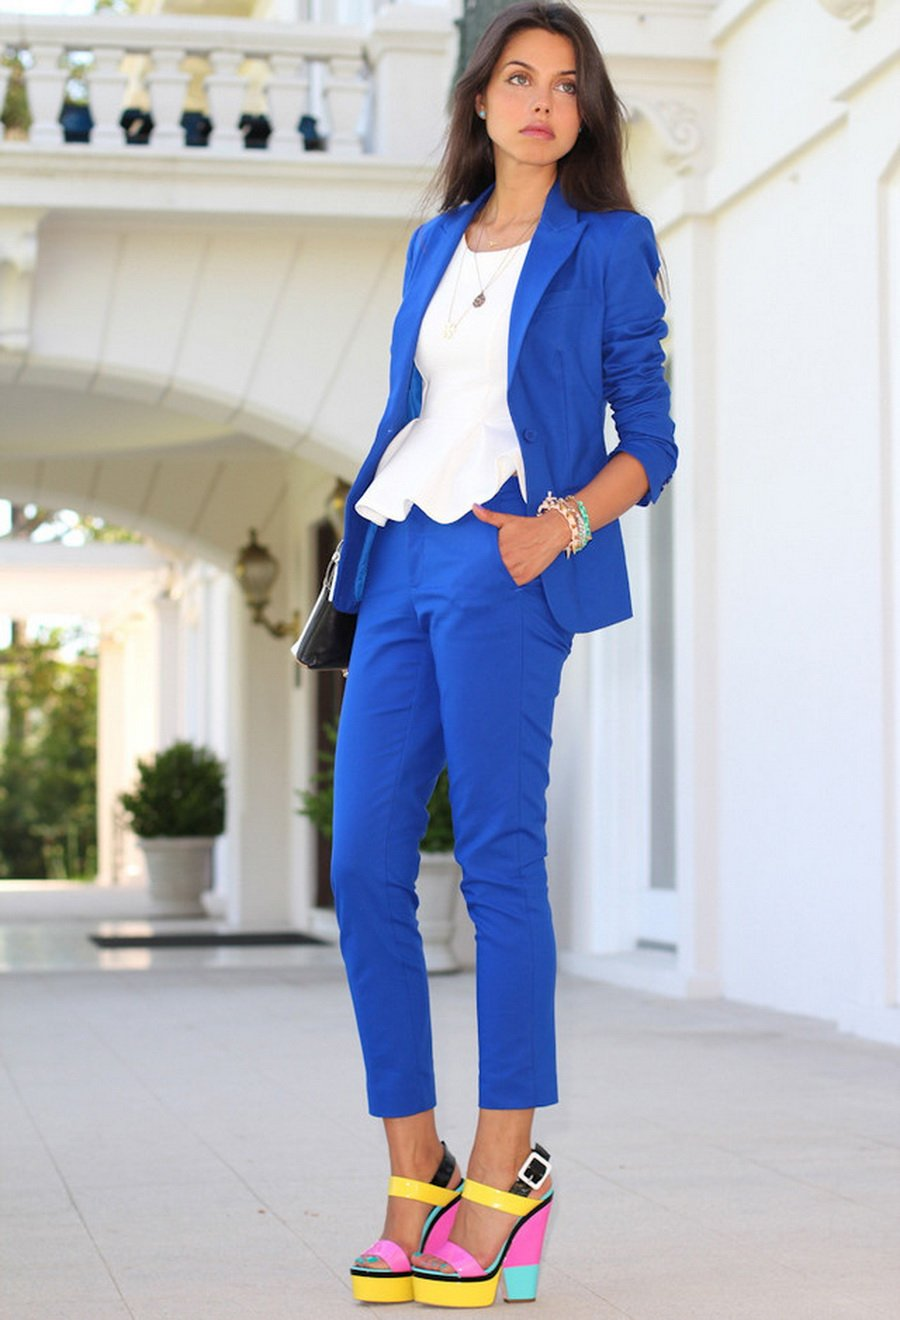 Conoce 15 Outfits De Oficina Que Hasta Tu Jefa Envidiaru00e1